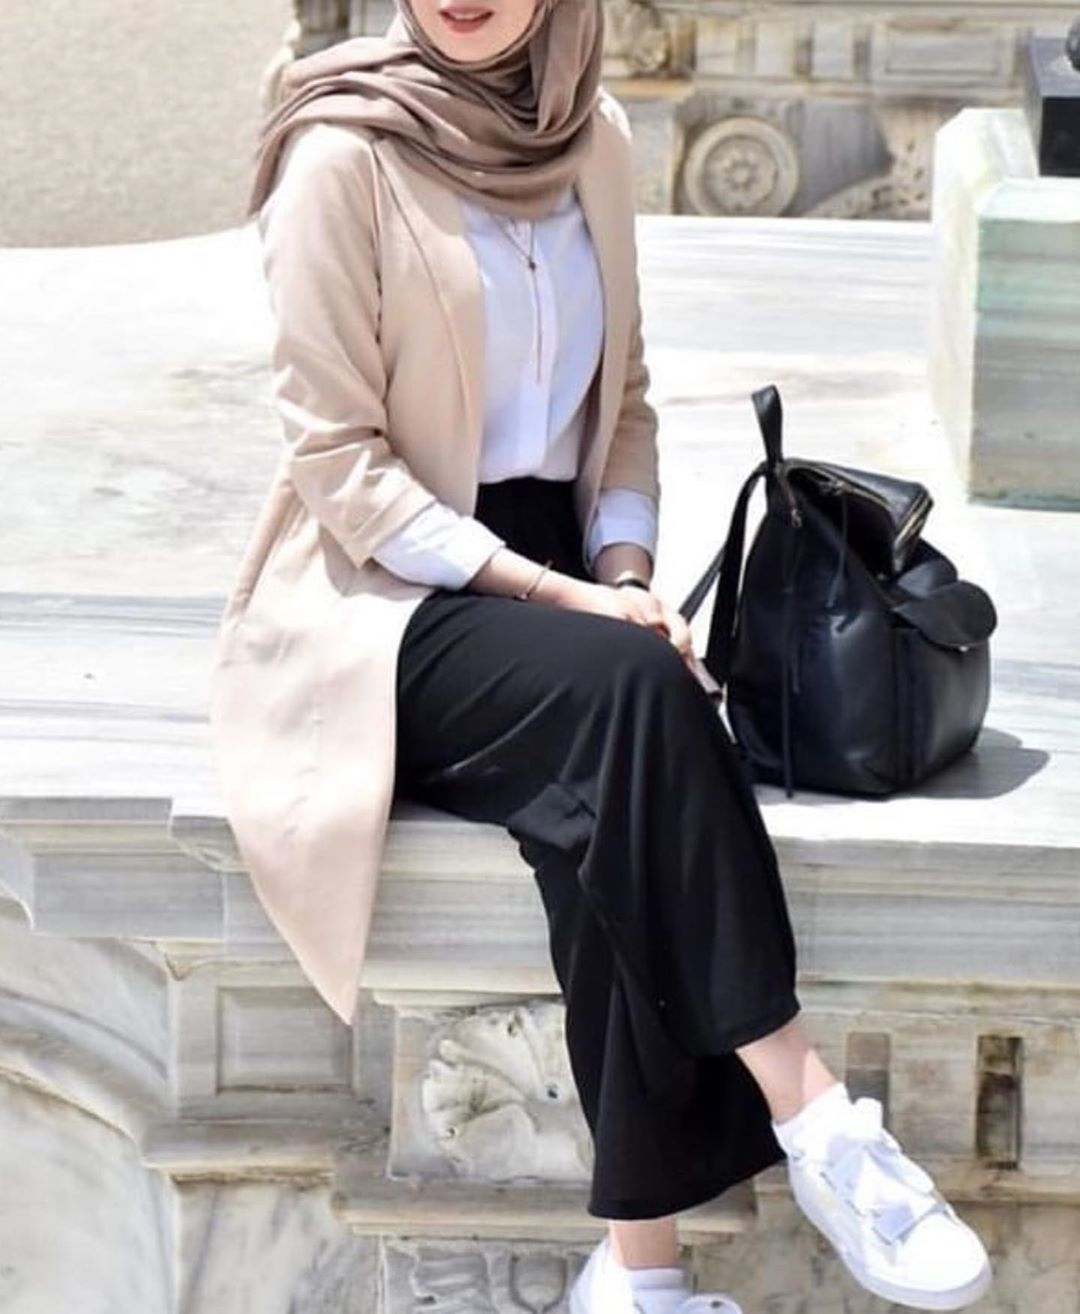 Modestfashion Modern Hijab Fashion Hijab Fashion Hijab Fashion Inspiration